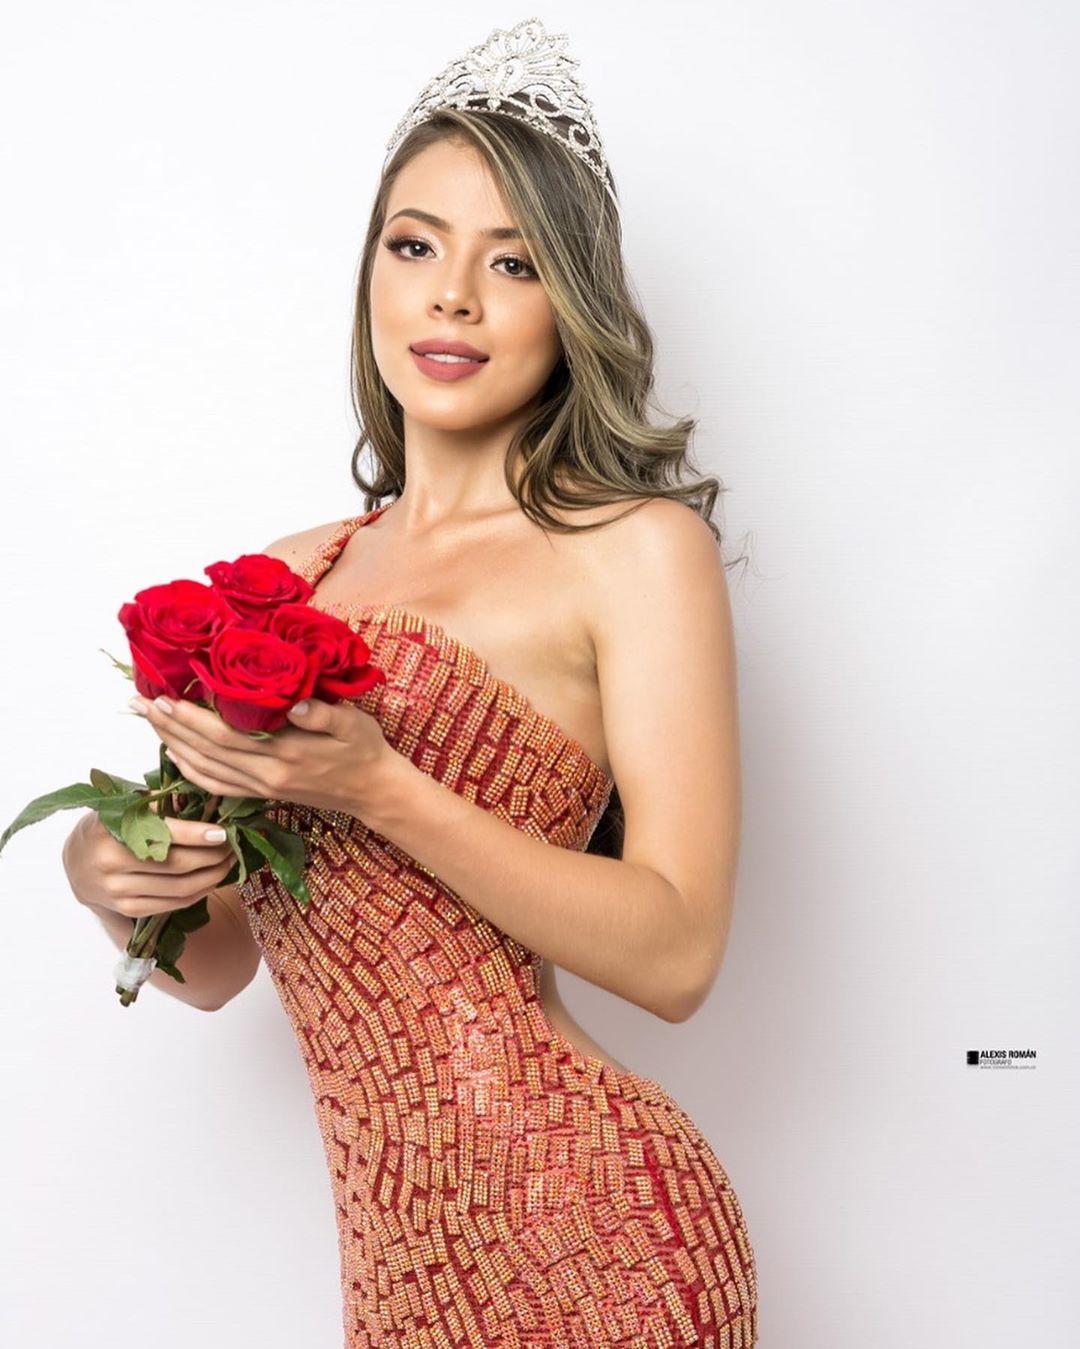 gina aguirre, virreyna de miss latinoamerica 2019. - Página 3 69104210